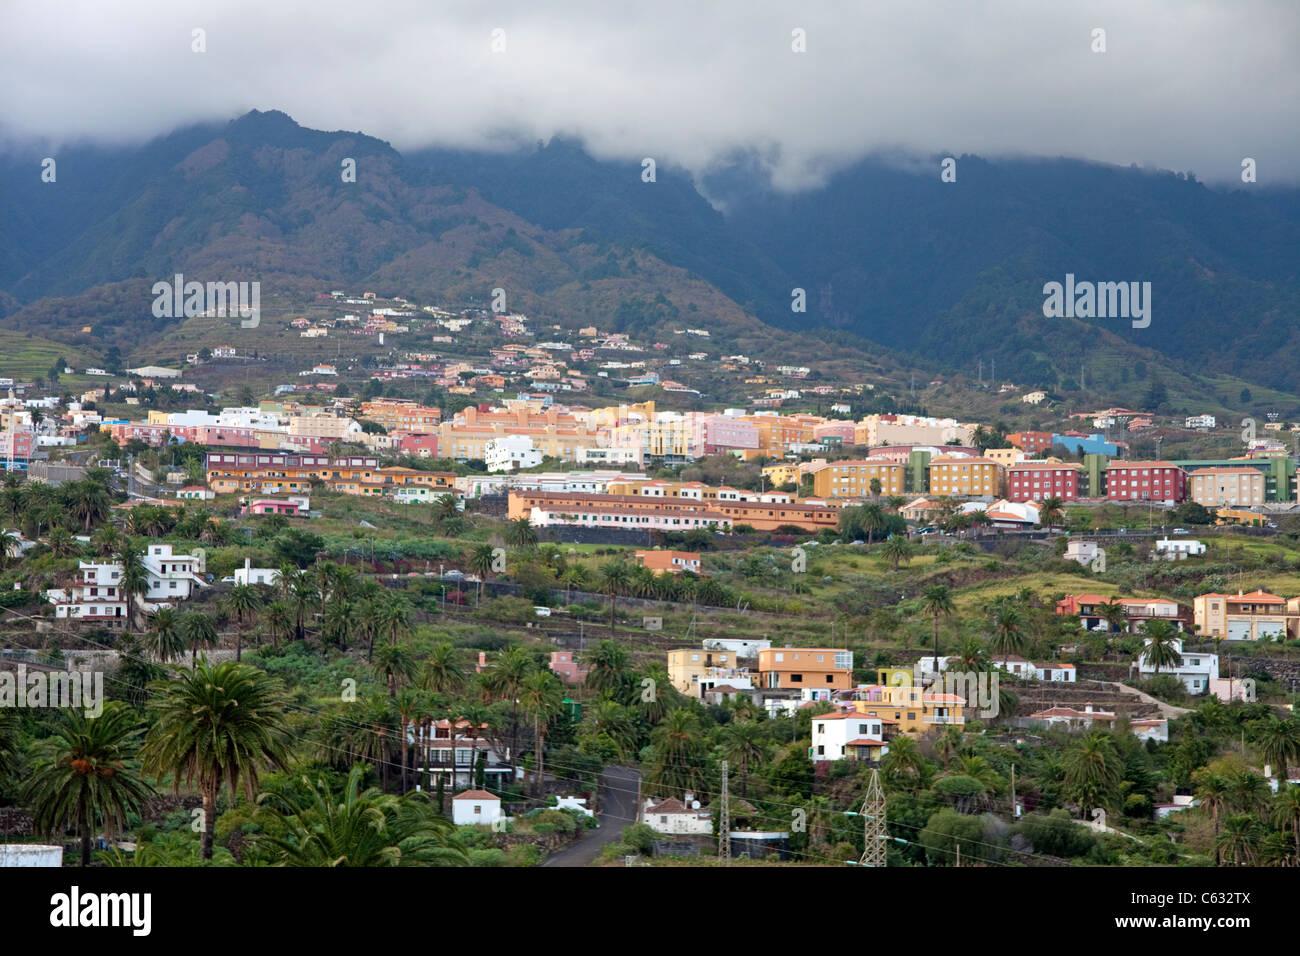 San Pedro, Dorf in Brena Alta, La Palma, Kanarische Inseln, Spanien, Europa Stockbild